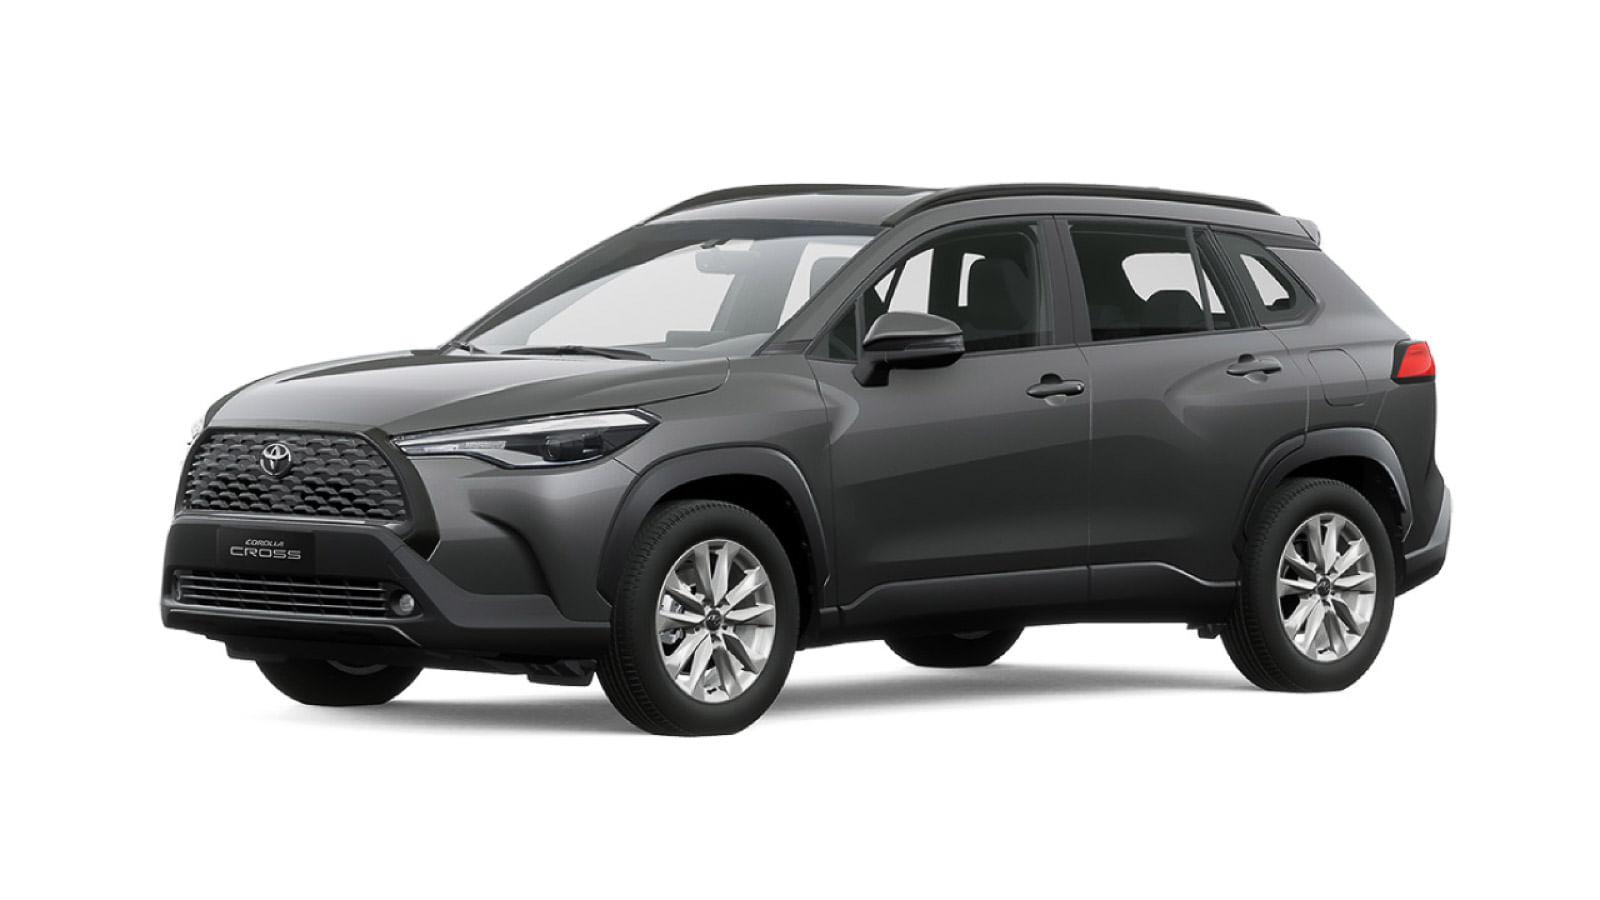 Toyota-Corolla-Cross-XEi-Gasolina-02065305-1